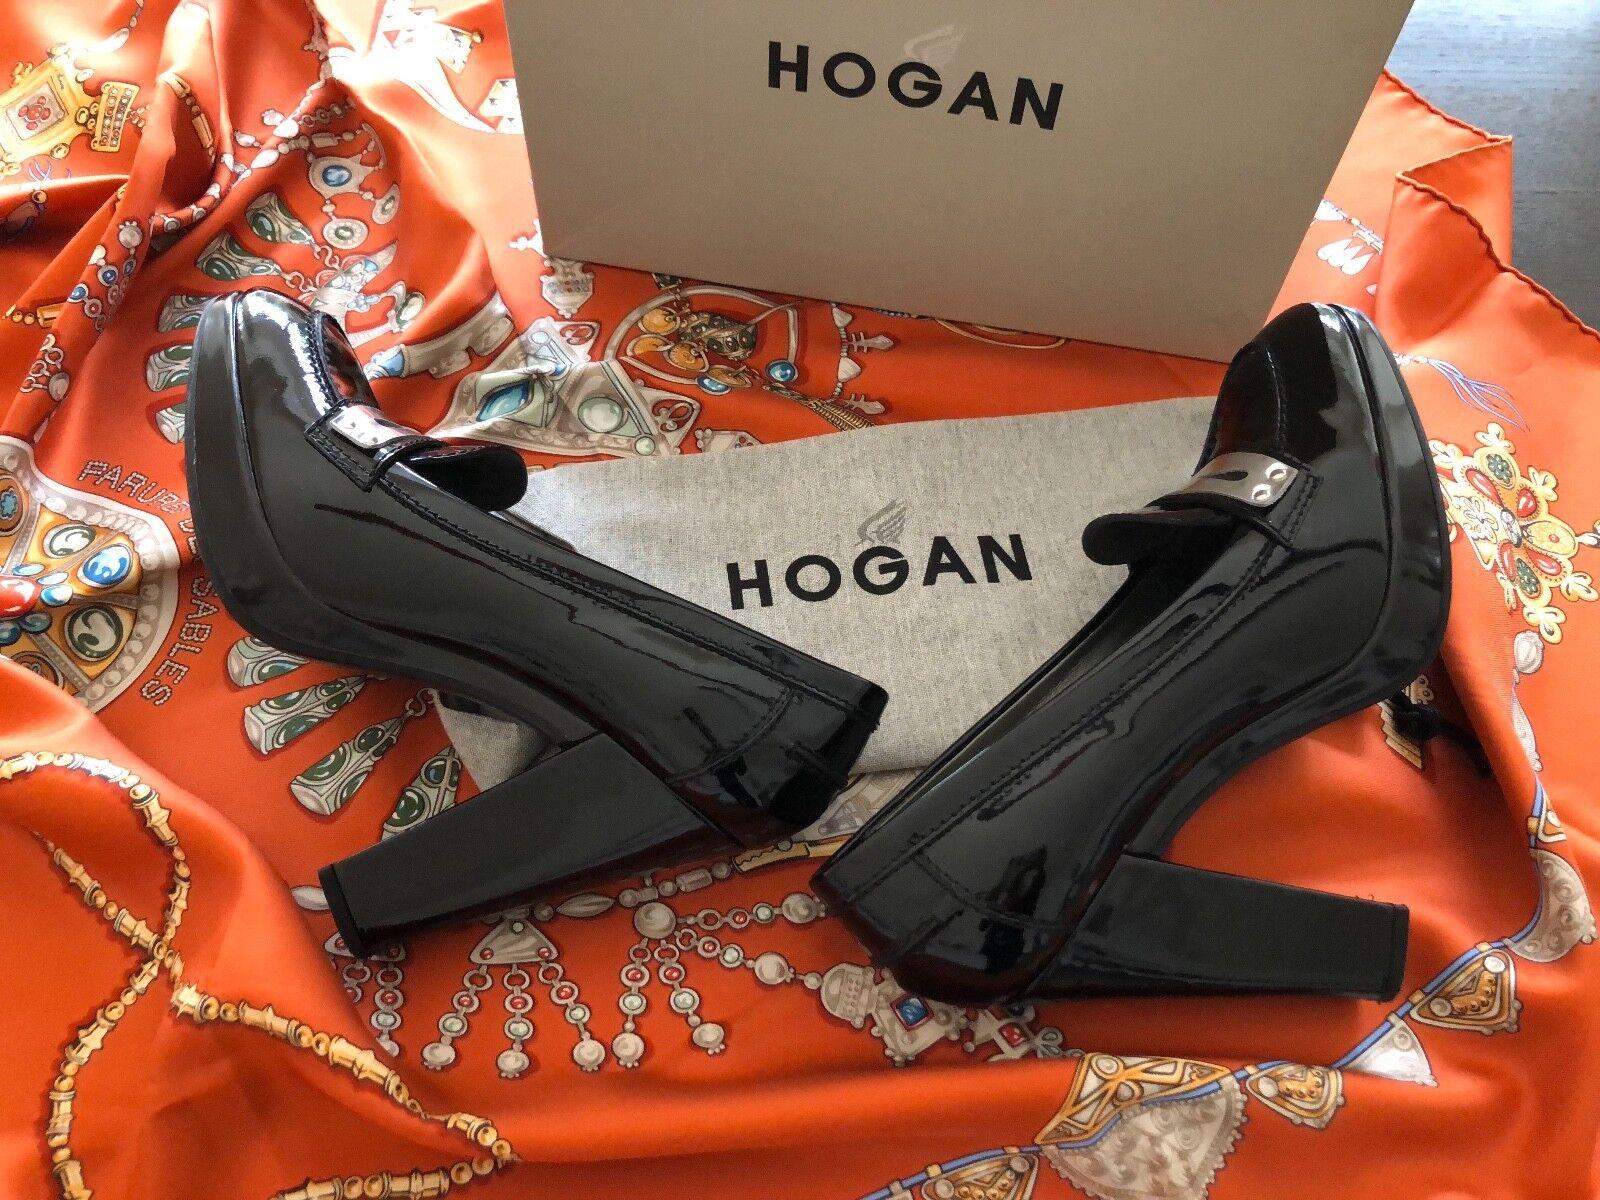 HOGAN 39,5  High Heels Plateau PUMPS Lack Leder Gr. 39,5 HOGAN College-Stil  wie neu 18f864